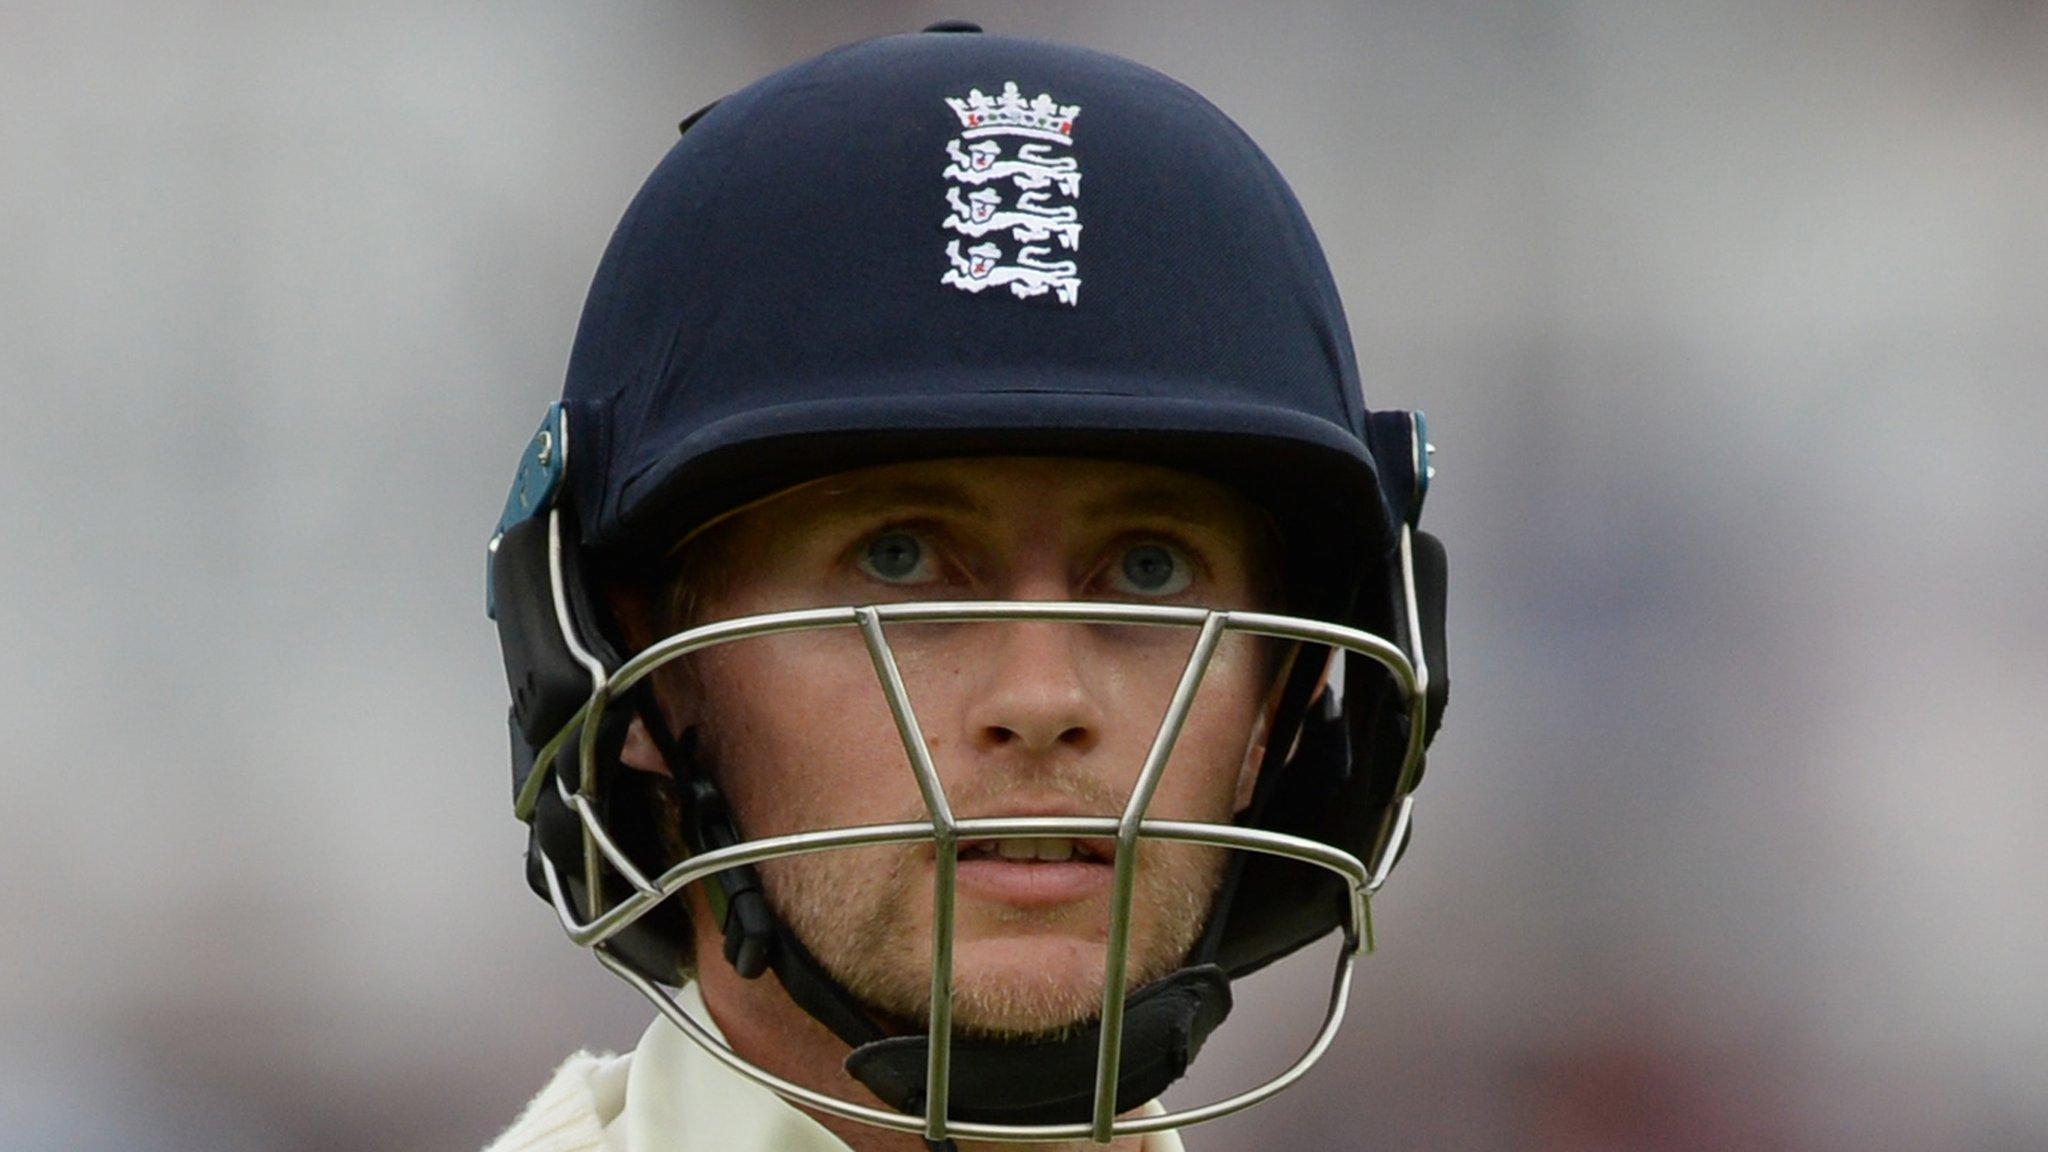 England v India: Michael Vaughan criticises 'fragility' of hosts' batting